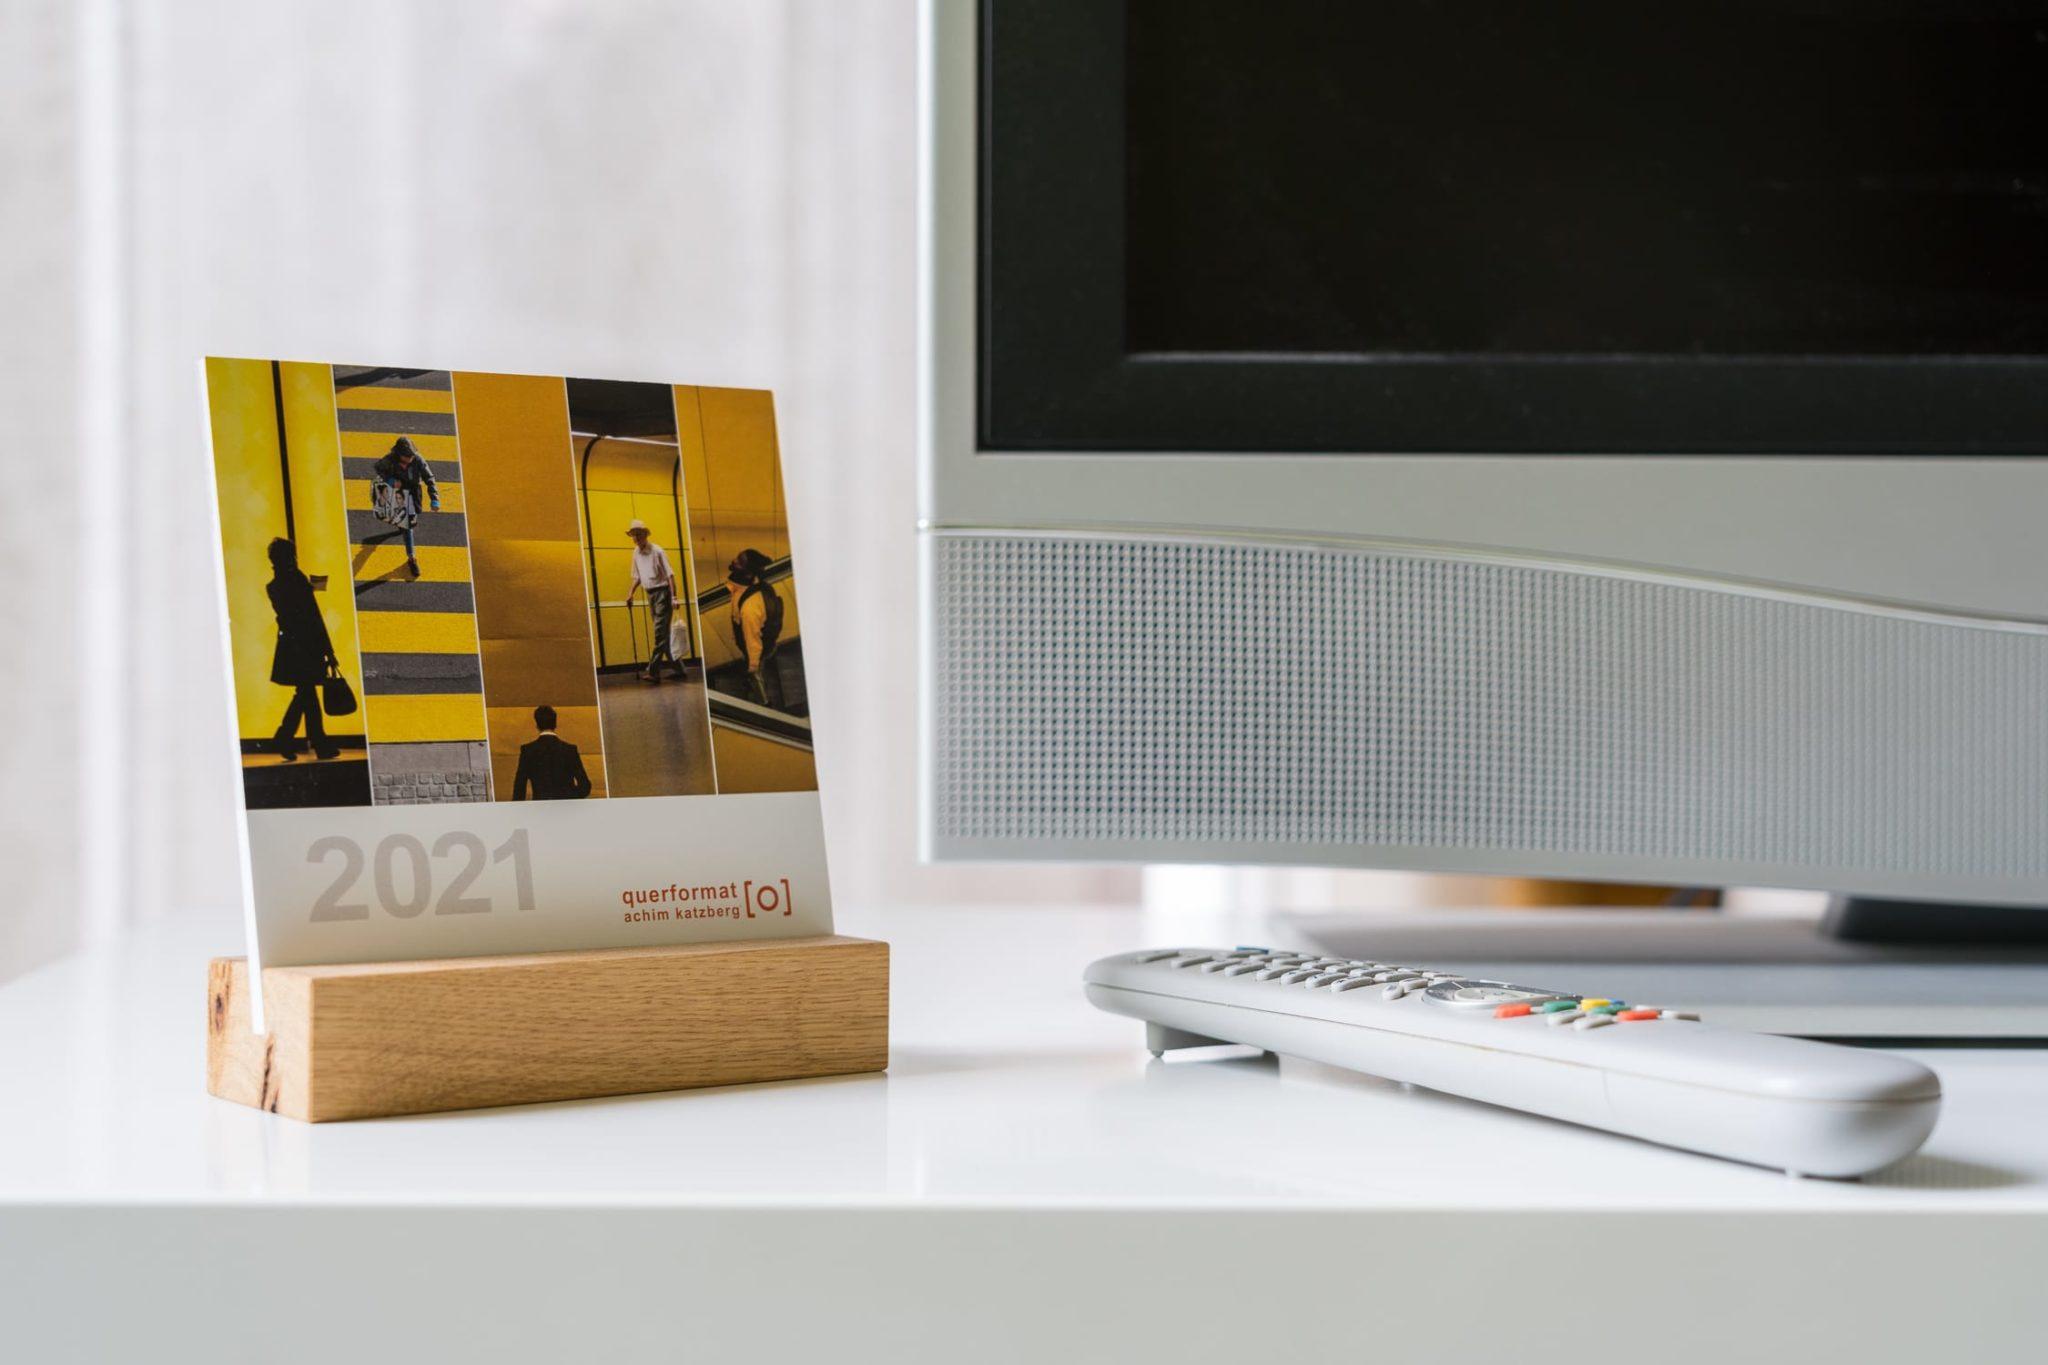 querformat-fotografie - Achim Katzberg - querformat-fotografie_Kalender_2021-001